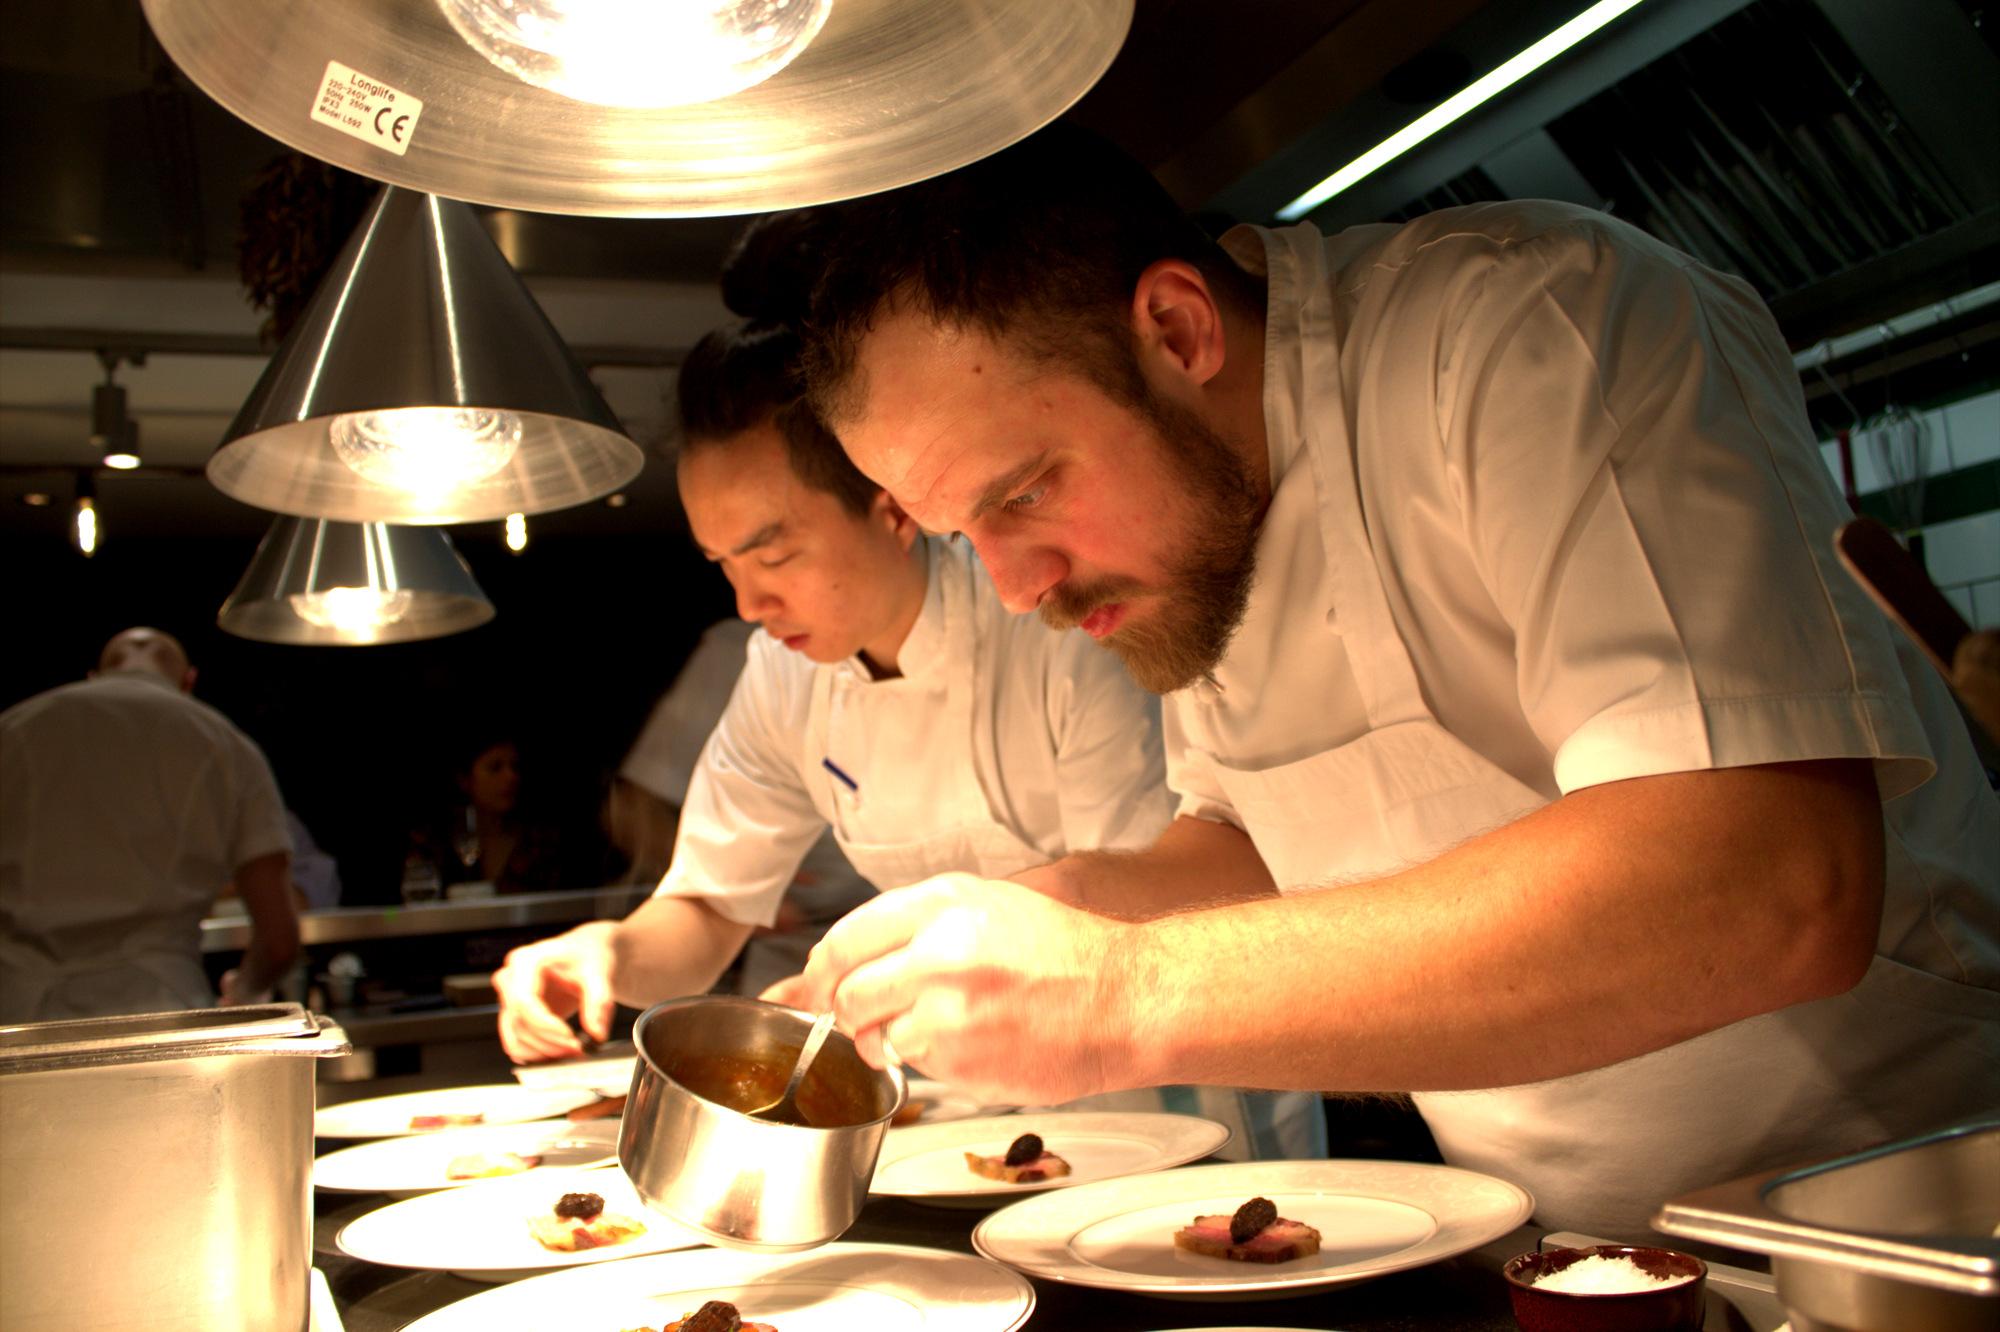 Executive Chef:James Knappett - Cuisine: Modern BritishMichelin: Two StarsAA: Three RosettesTwitter: @bubbledogsktInstagram: @kitchentable1Address: 70 Charlotte St, Fitzrovia, London W1T 4QQ Phone: 020 7637 7770 Website: kitchentablelondon.co.uk